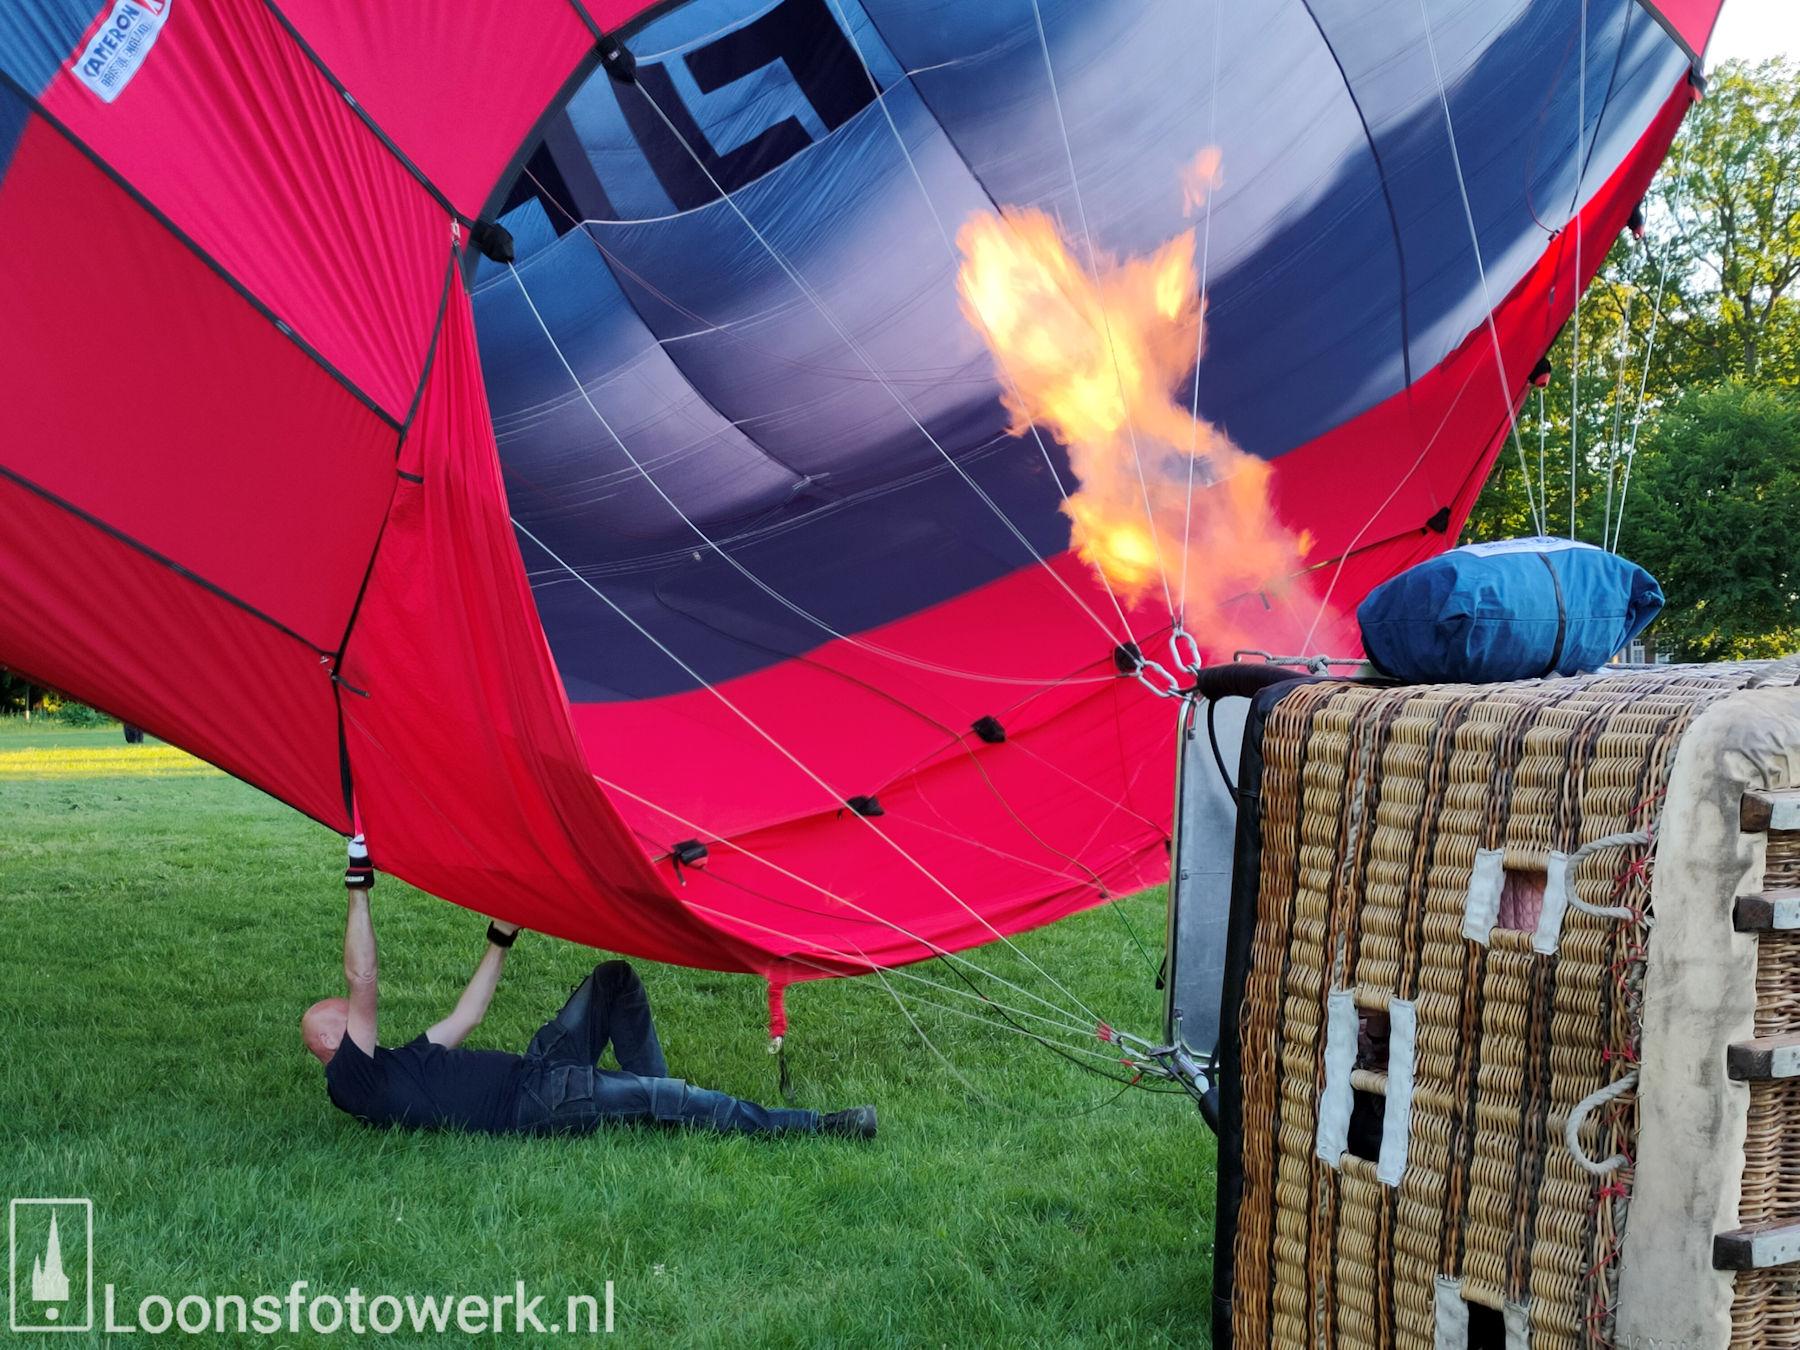 Ballonvaart vanaf de Kasteelweide 21